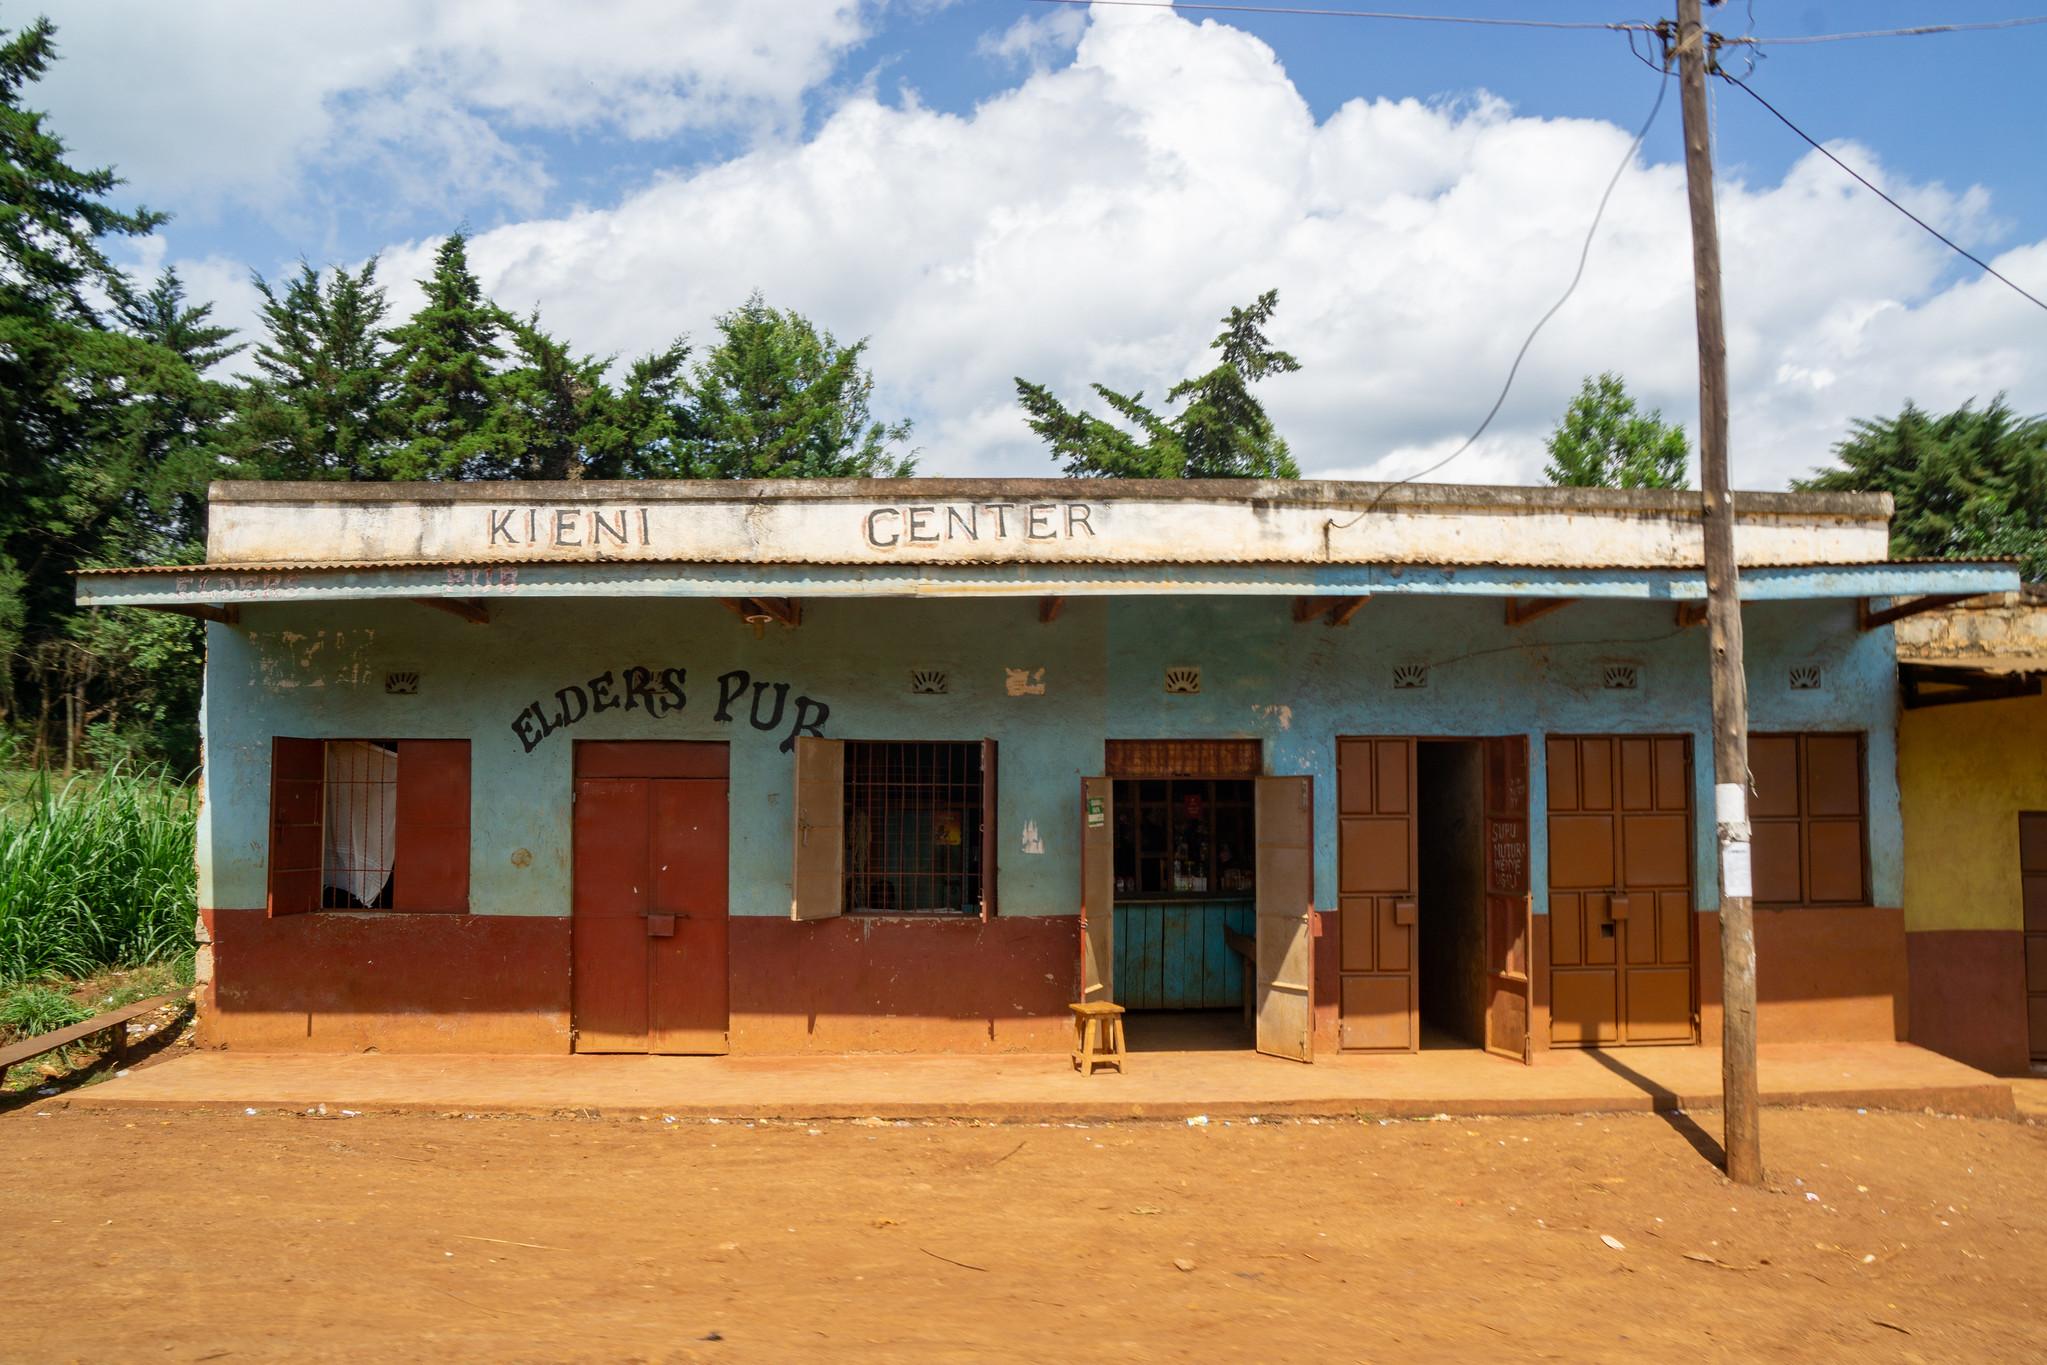 Kieni kooperativets center